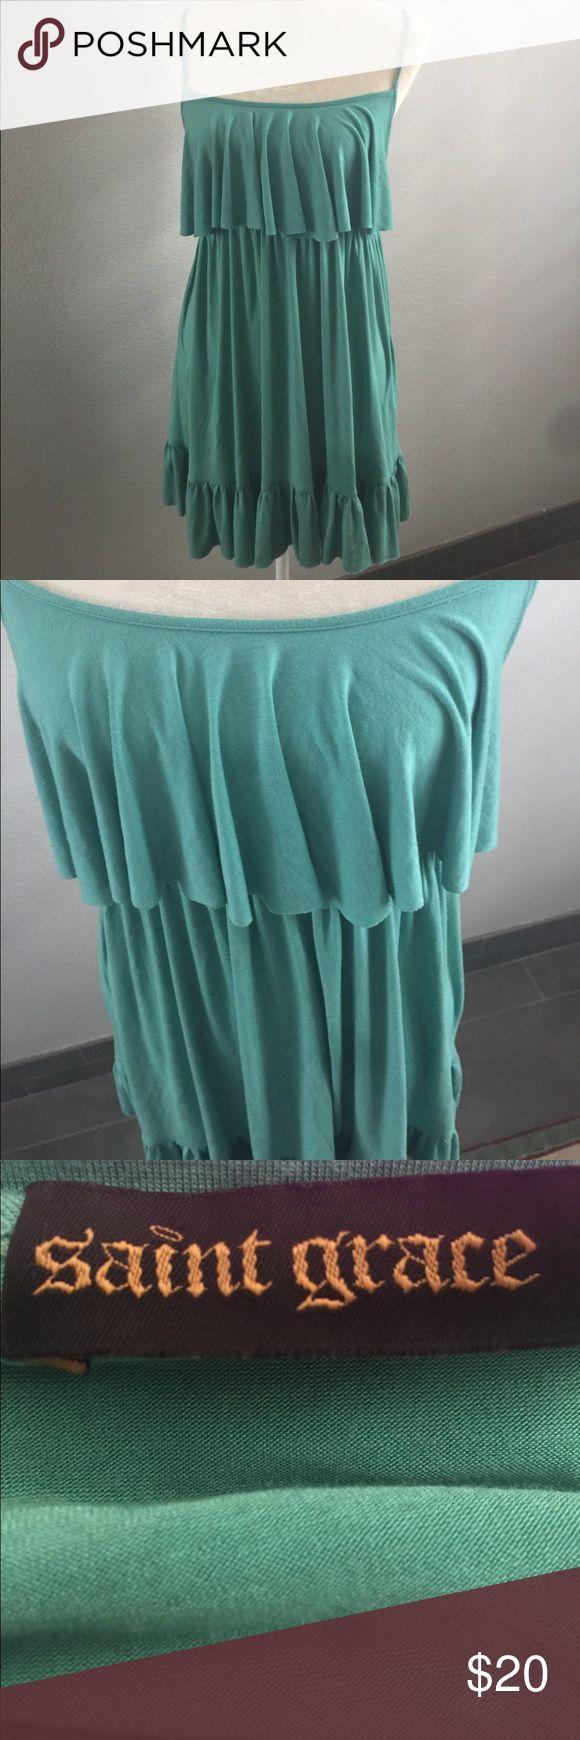 Saint grace sundress Saint grace sundress... condition lightly worn. Saint Grace Dresses Mini